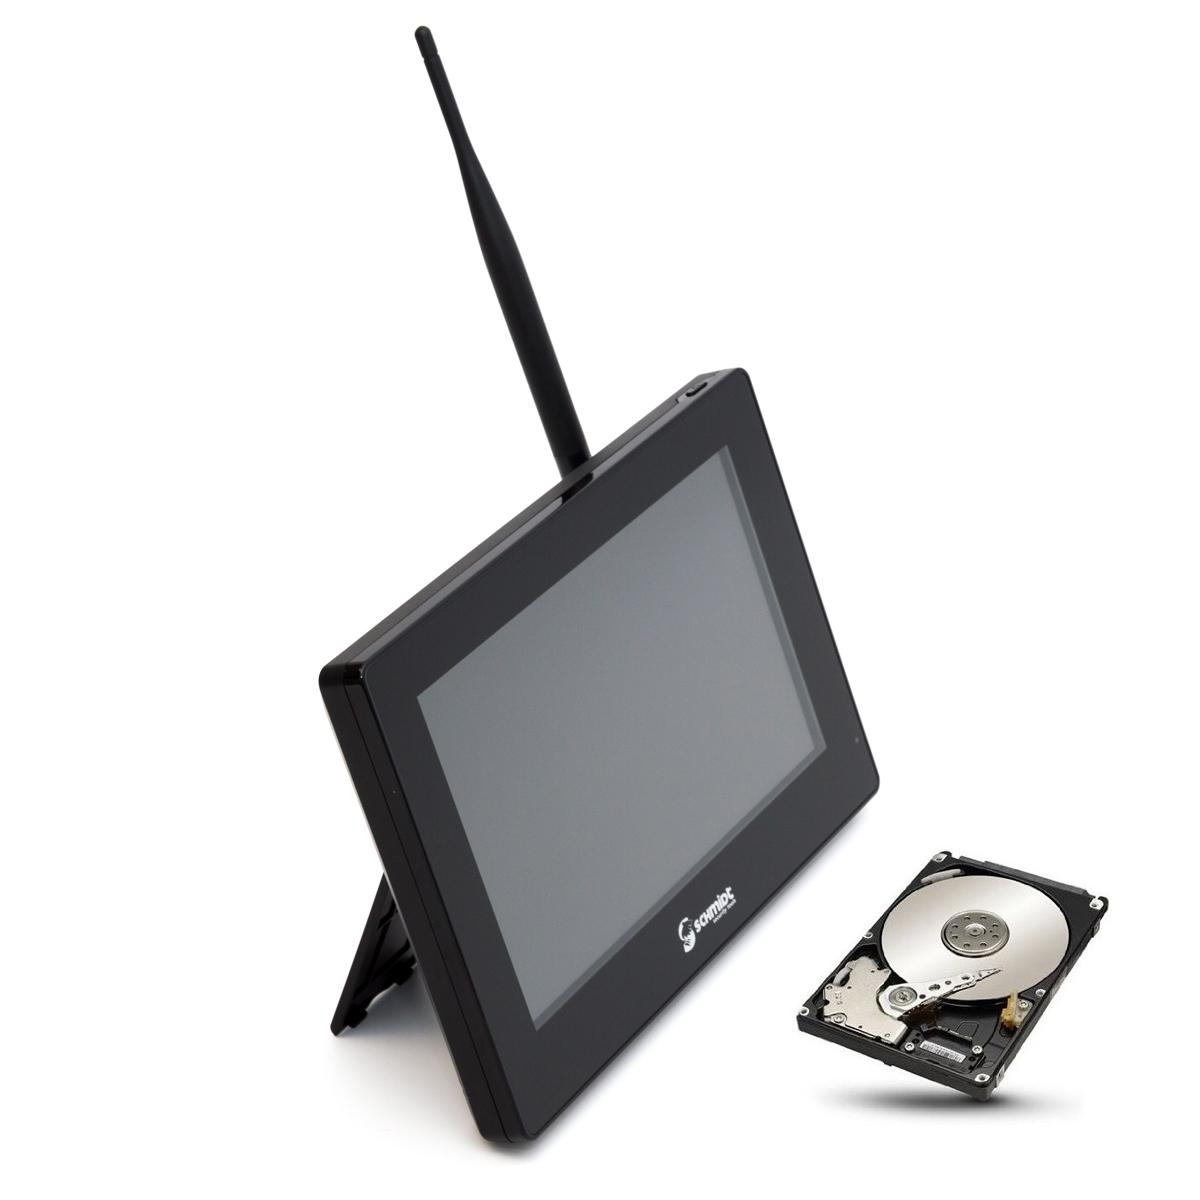 "SCHMIDT-Security-Tools Funk-Überwachungssystem 2x Kamera 9"" Touch-Monitor mit Standfuß HD Videoüberwachungsanlage Drahtlos Überwachungsset Sicherheitssystem 500GB HDD Festplatte"